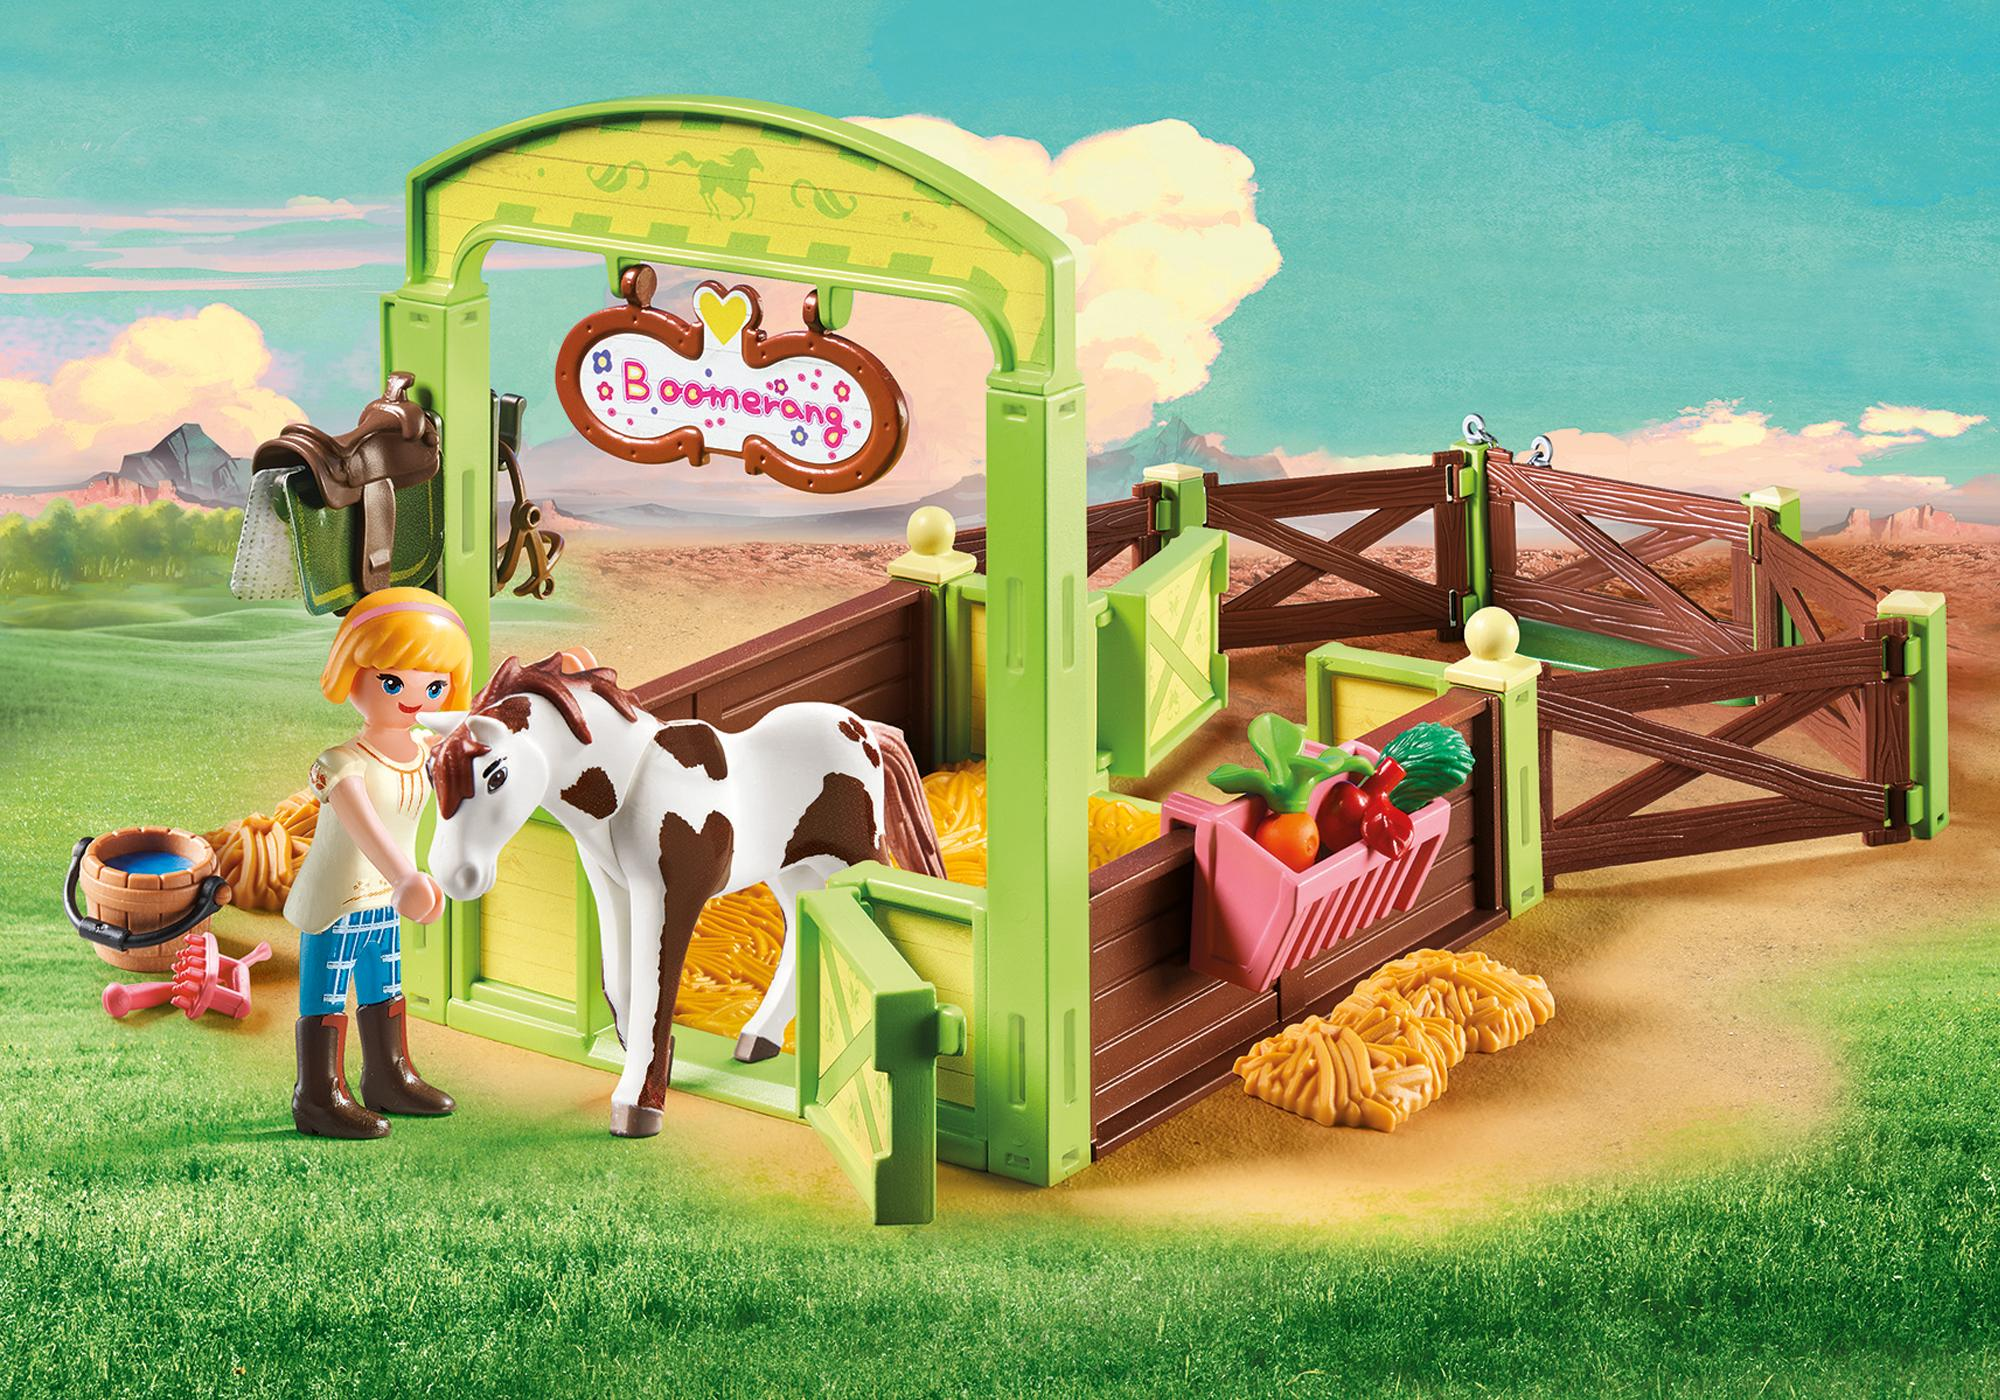 http://media.playmobil.com/i/playmobil/9480_product_detail/Abigail & Boomerang met paardenbox